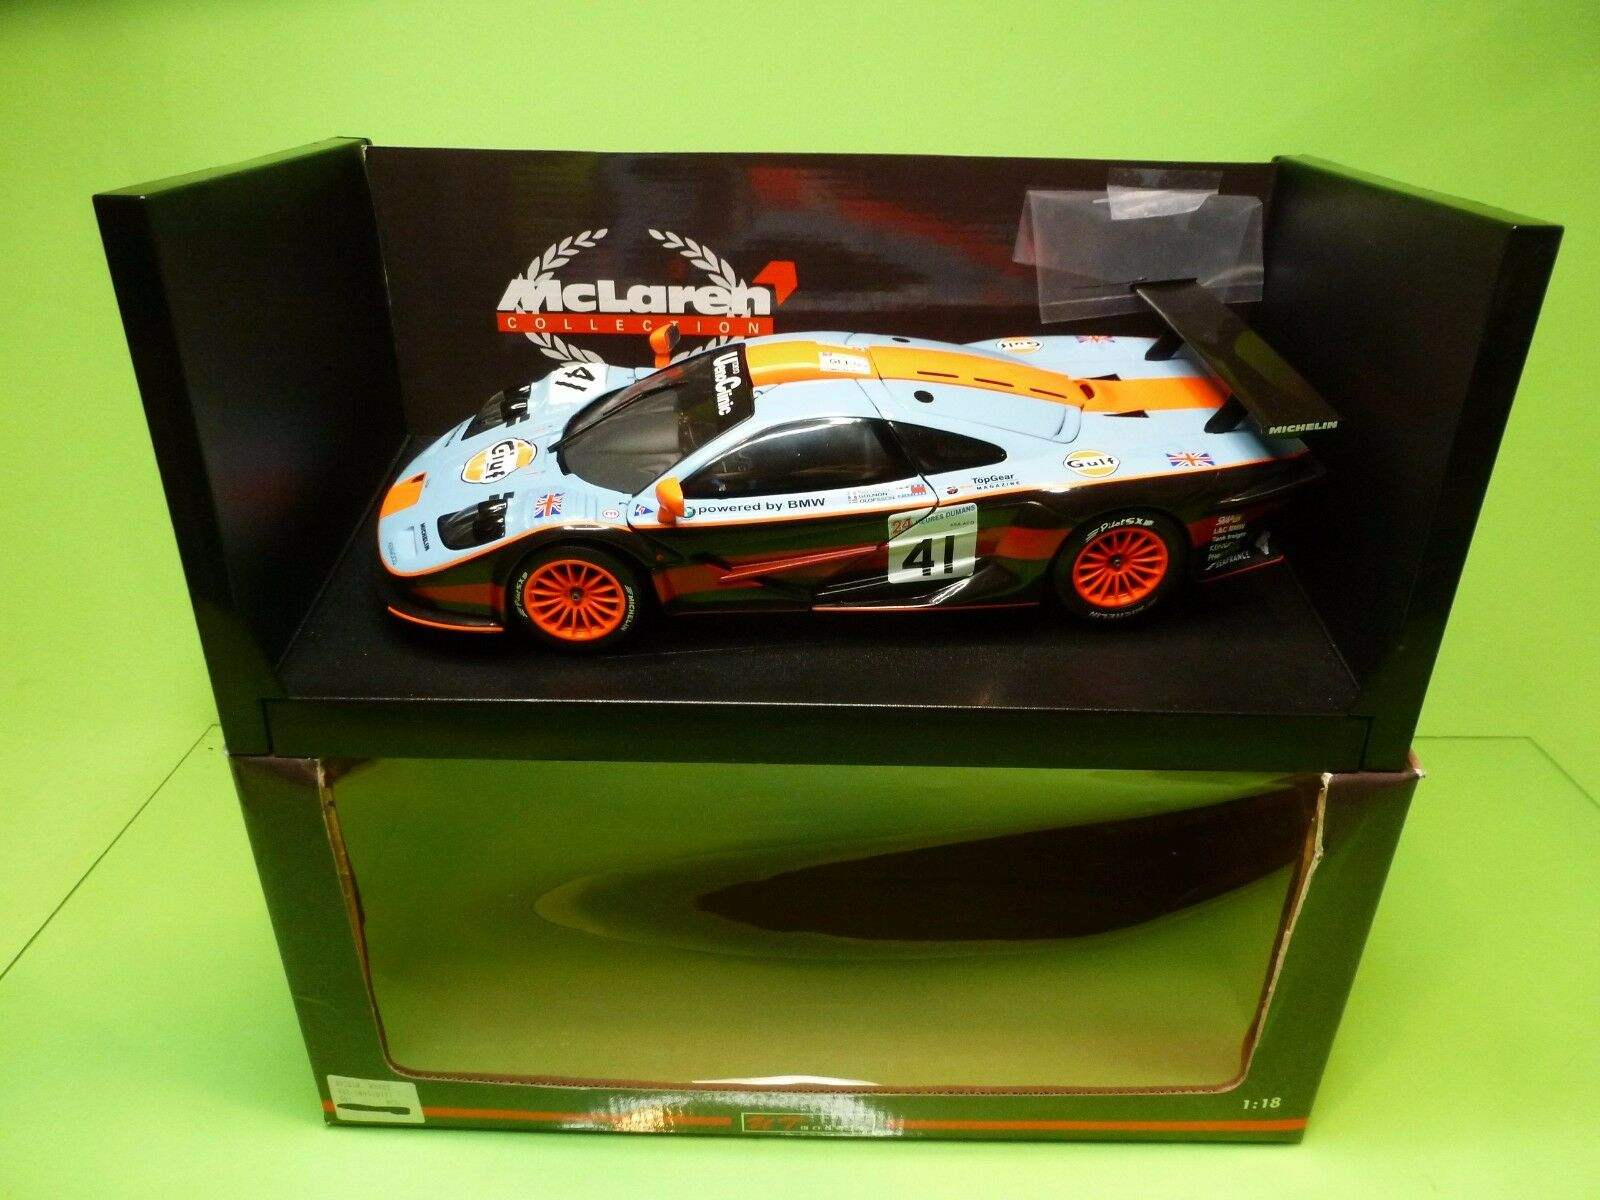 UT MODELS 39727 McLAREN F1 GTR LE  MANS 1997 - GULF BLUE 1:18 - EXCELLENT IN BOX